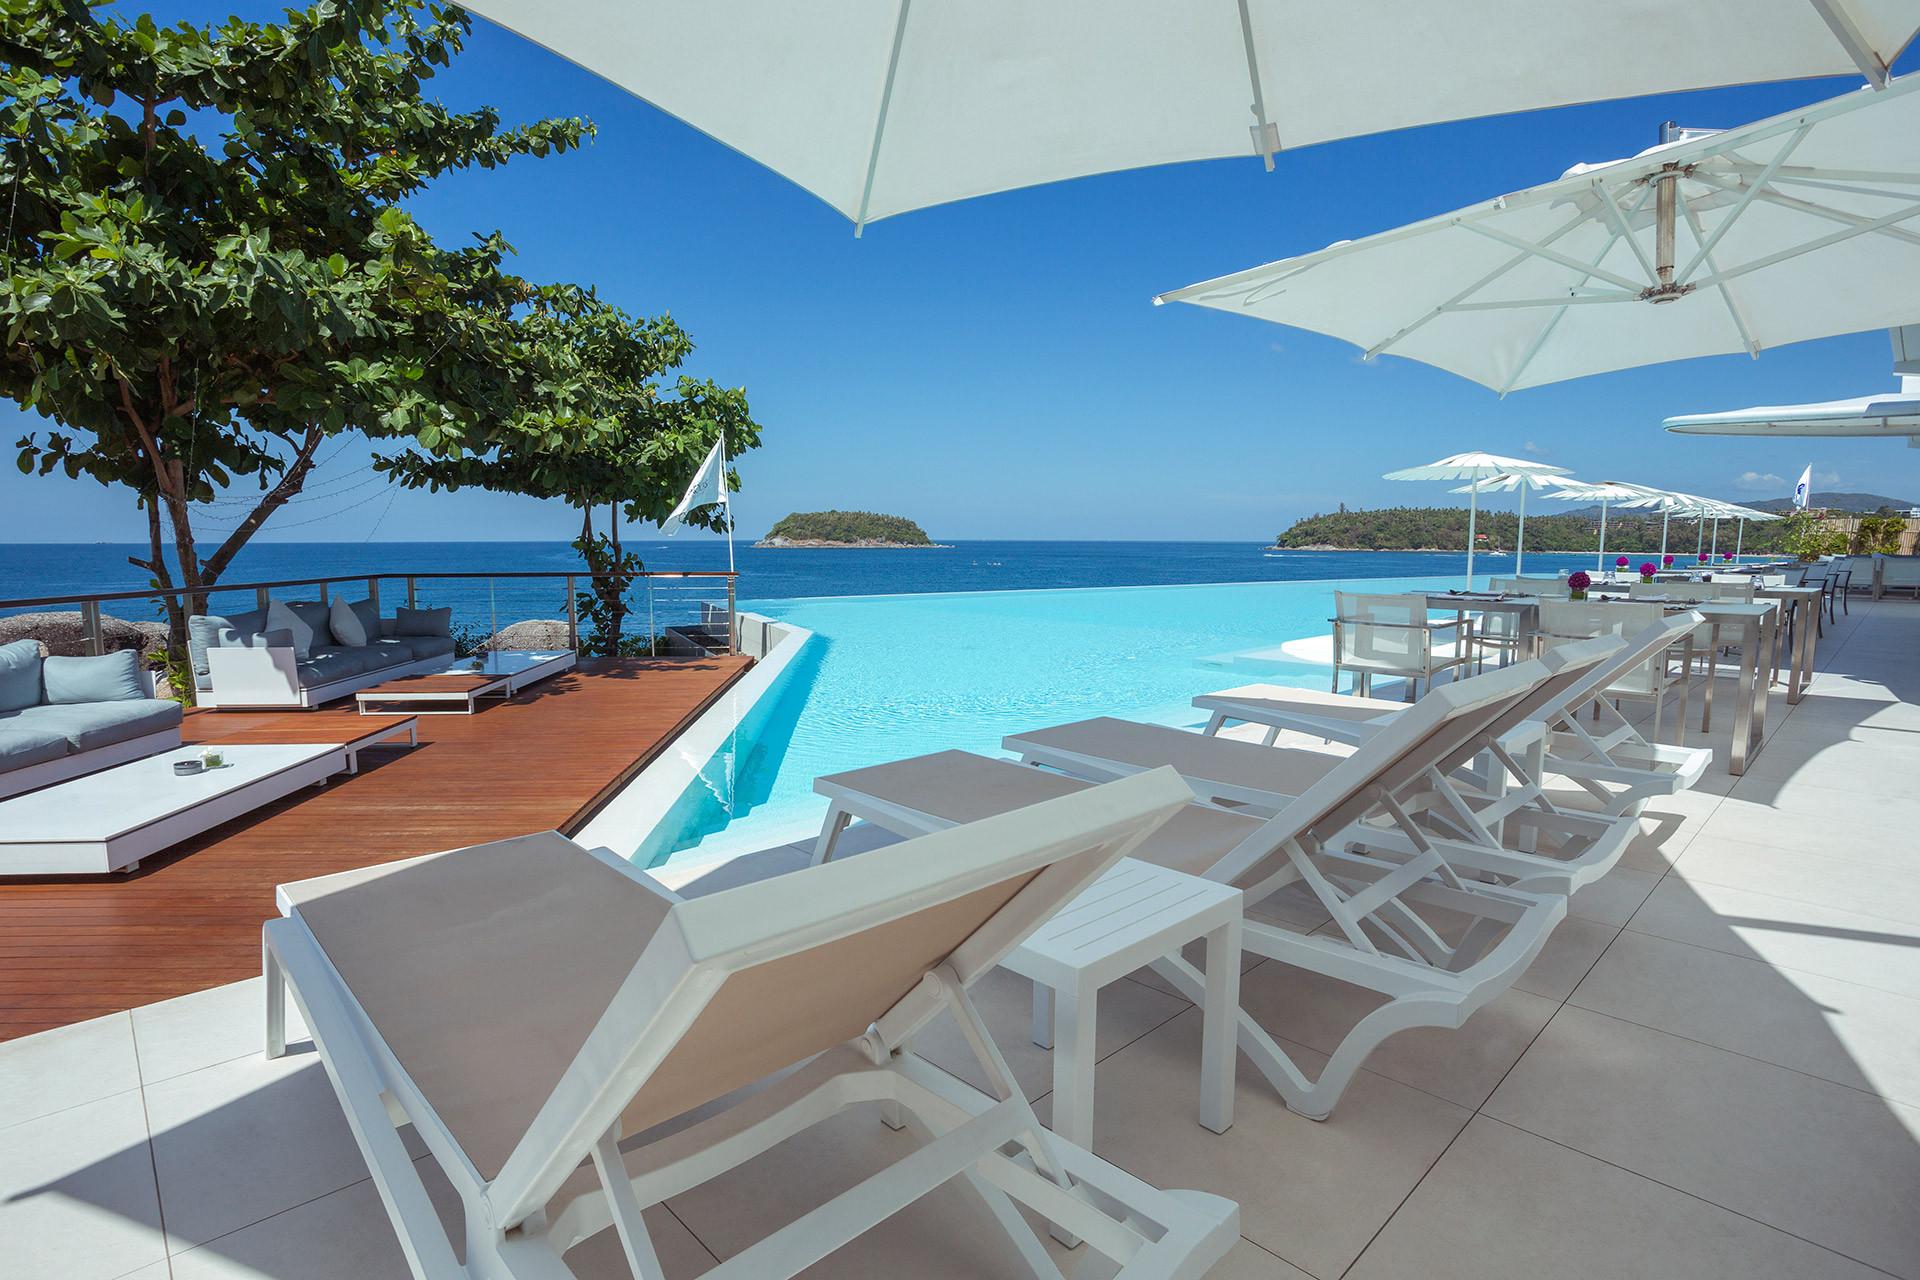 Best Infinity pool in Phuket at Kata Rocks